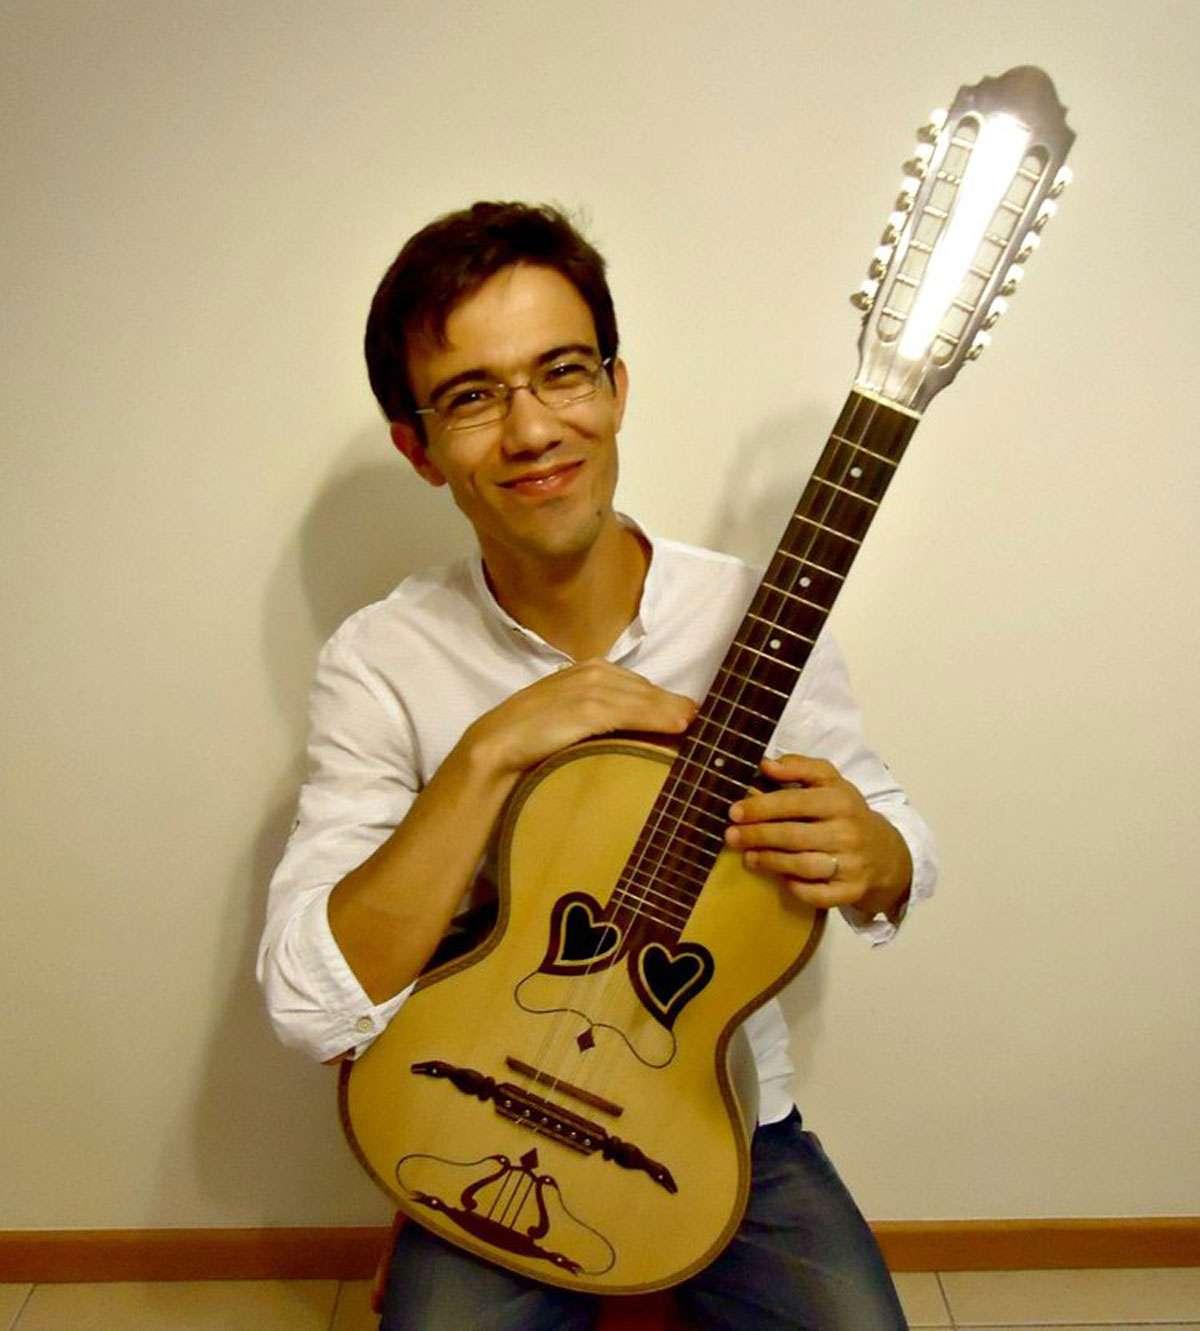 Rafael Carvalho, an Azorean musician, composer & teacher. Photo: Rafael Carvalho